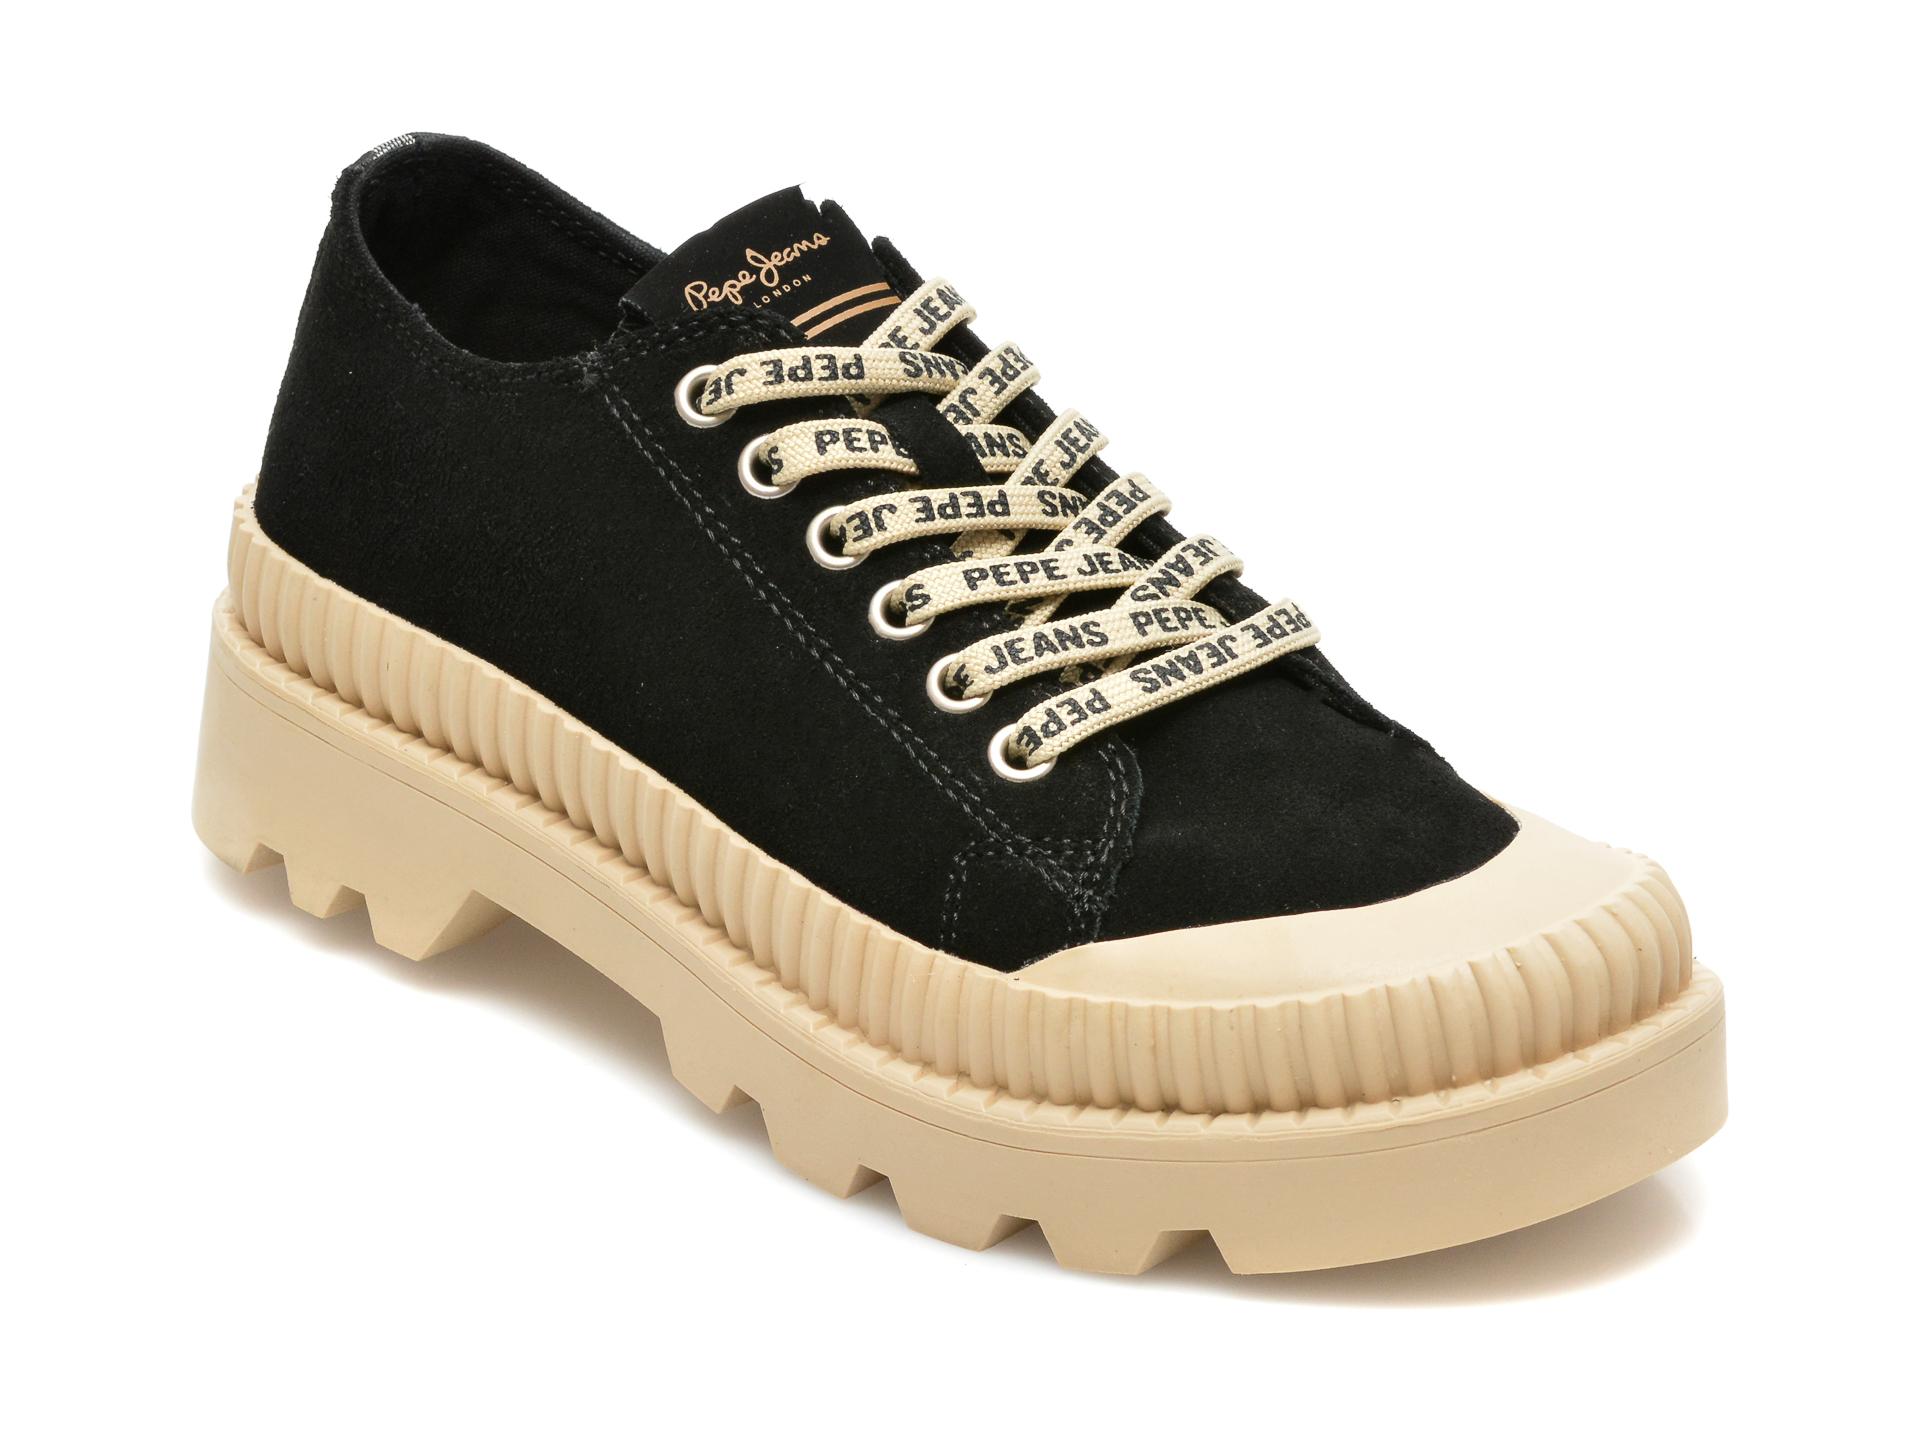 Pantofi PEPE JEANS negri, LS10401, din piele intoarsa